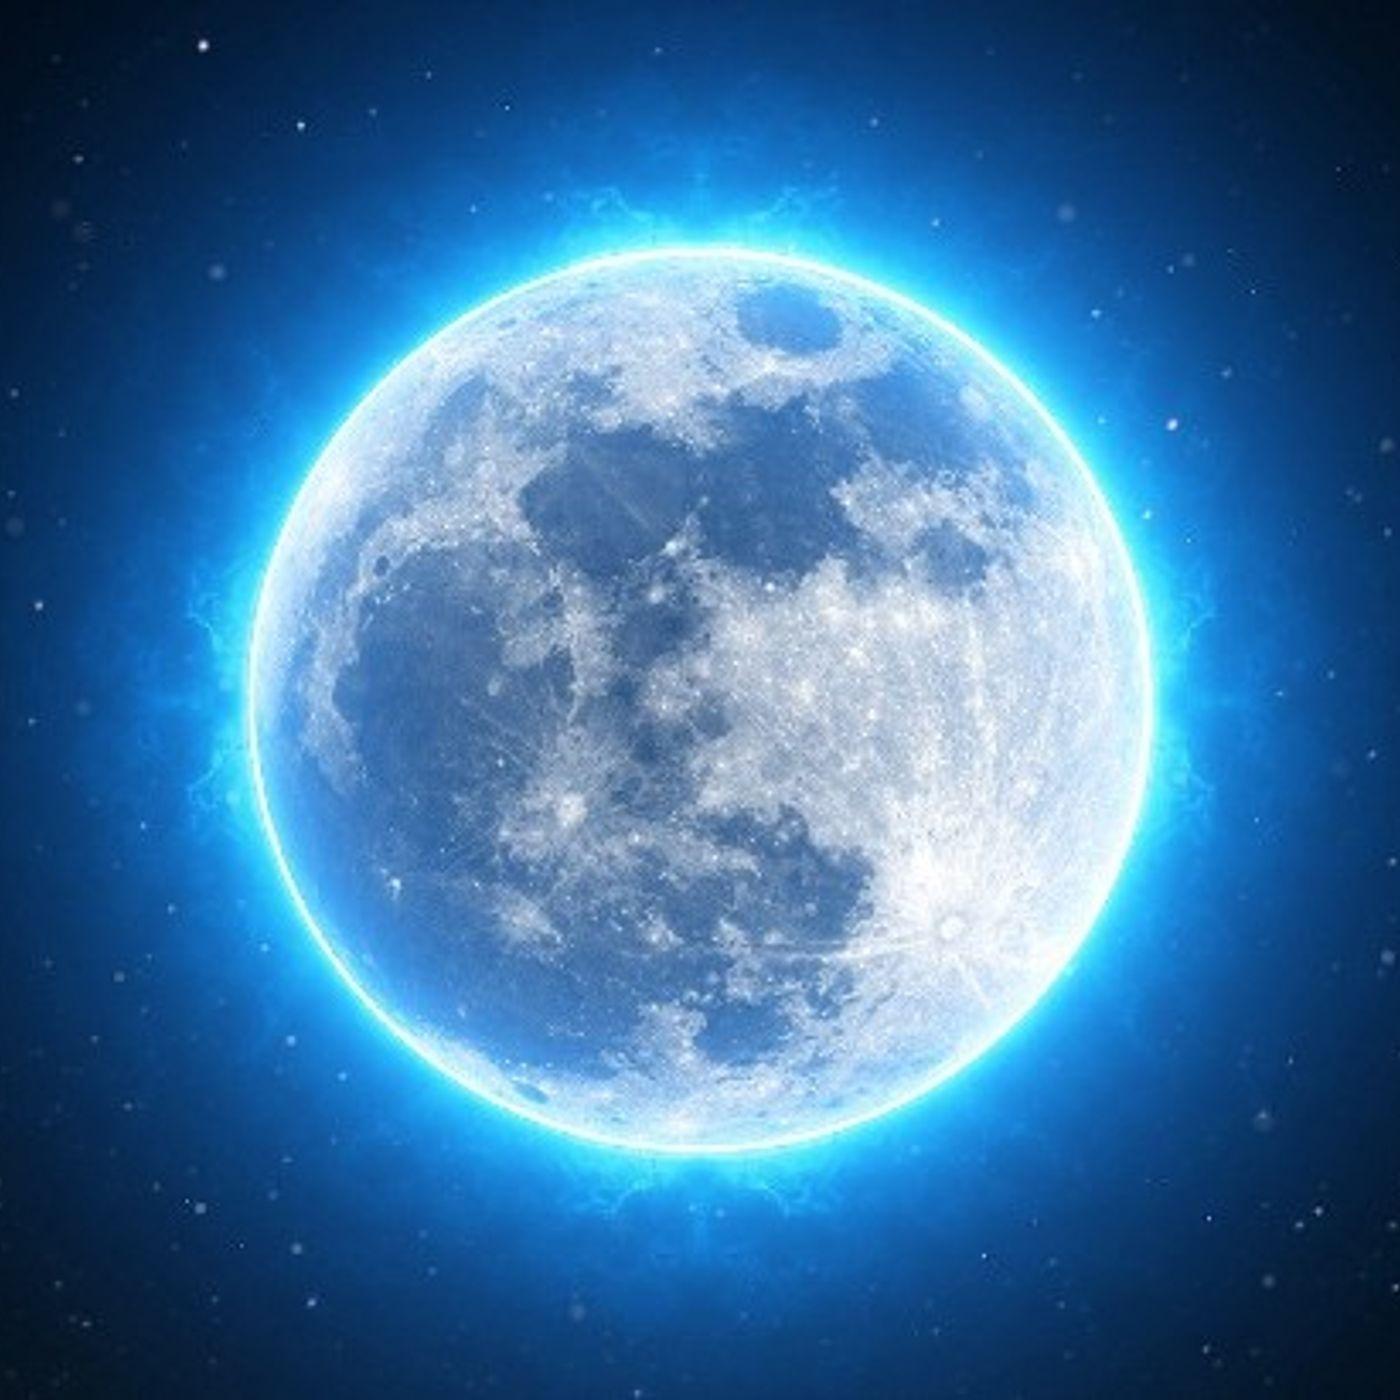 Pódcast HistorHilando T1E8: Las lunas del planeta Tierra